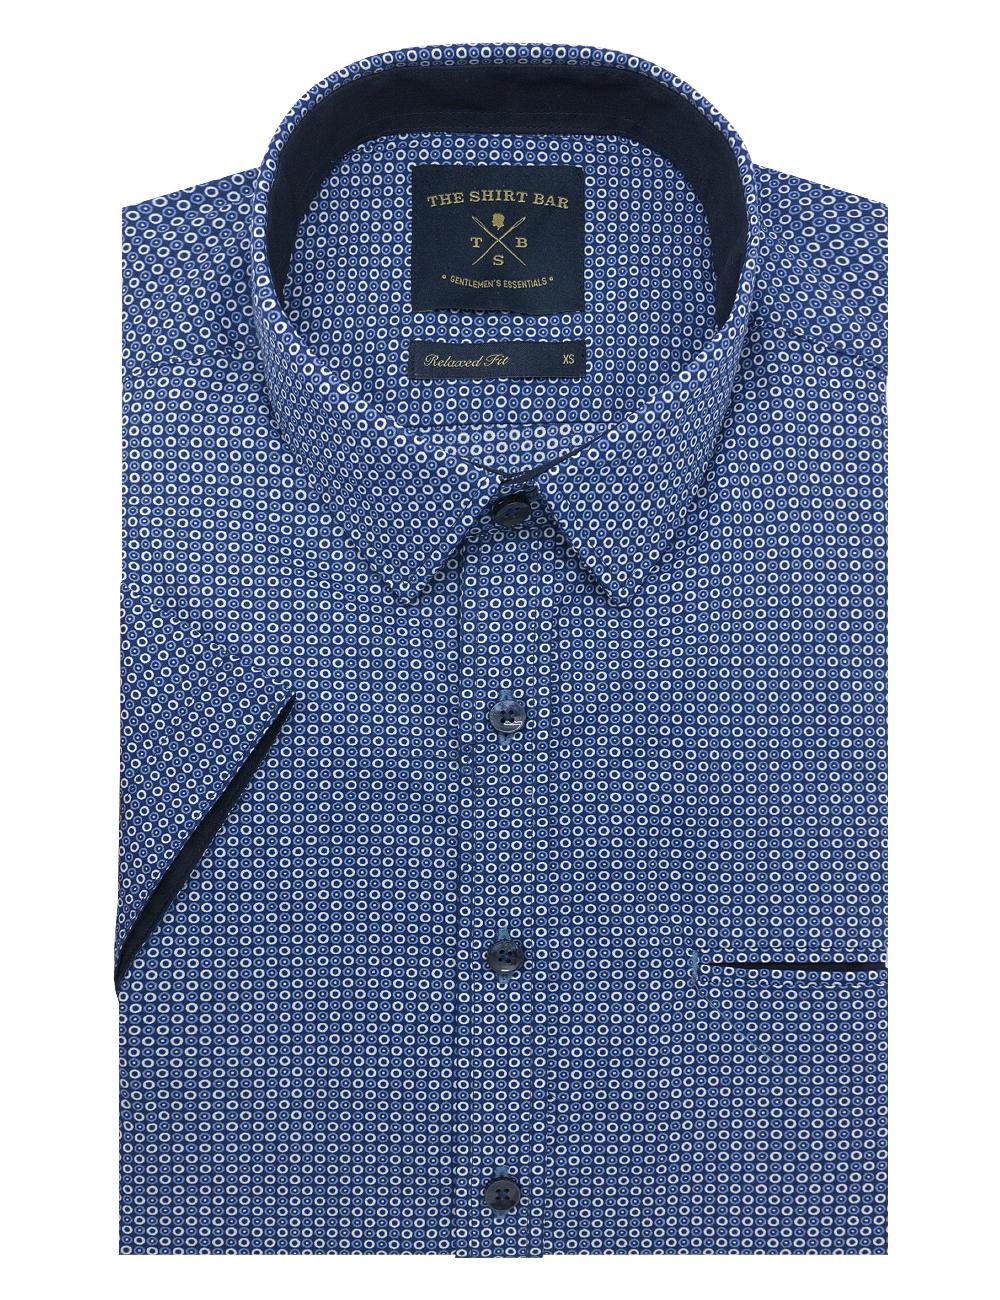 Blue Polka Dots Custom / Relaxed Fit Short Sleeve Shirt - RF9SNB7.19